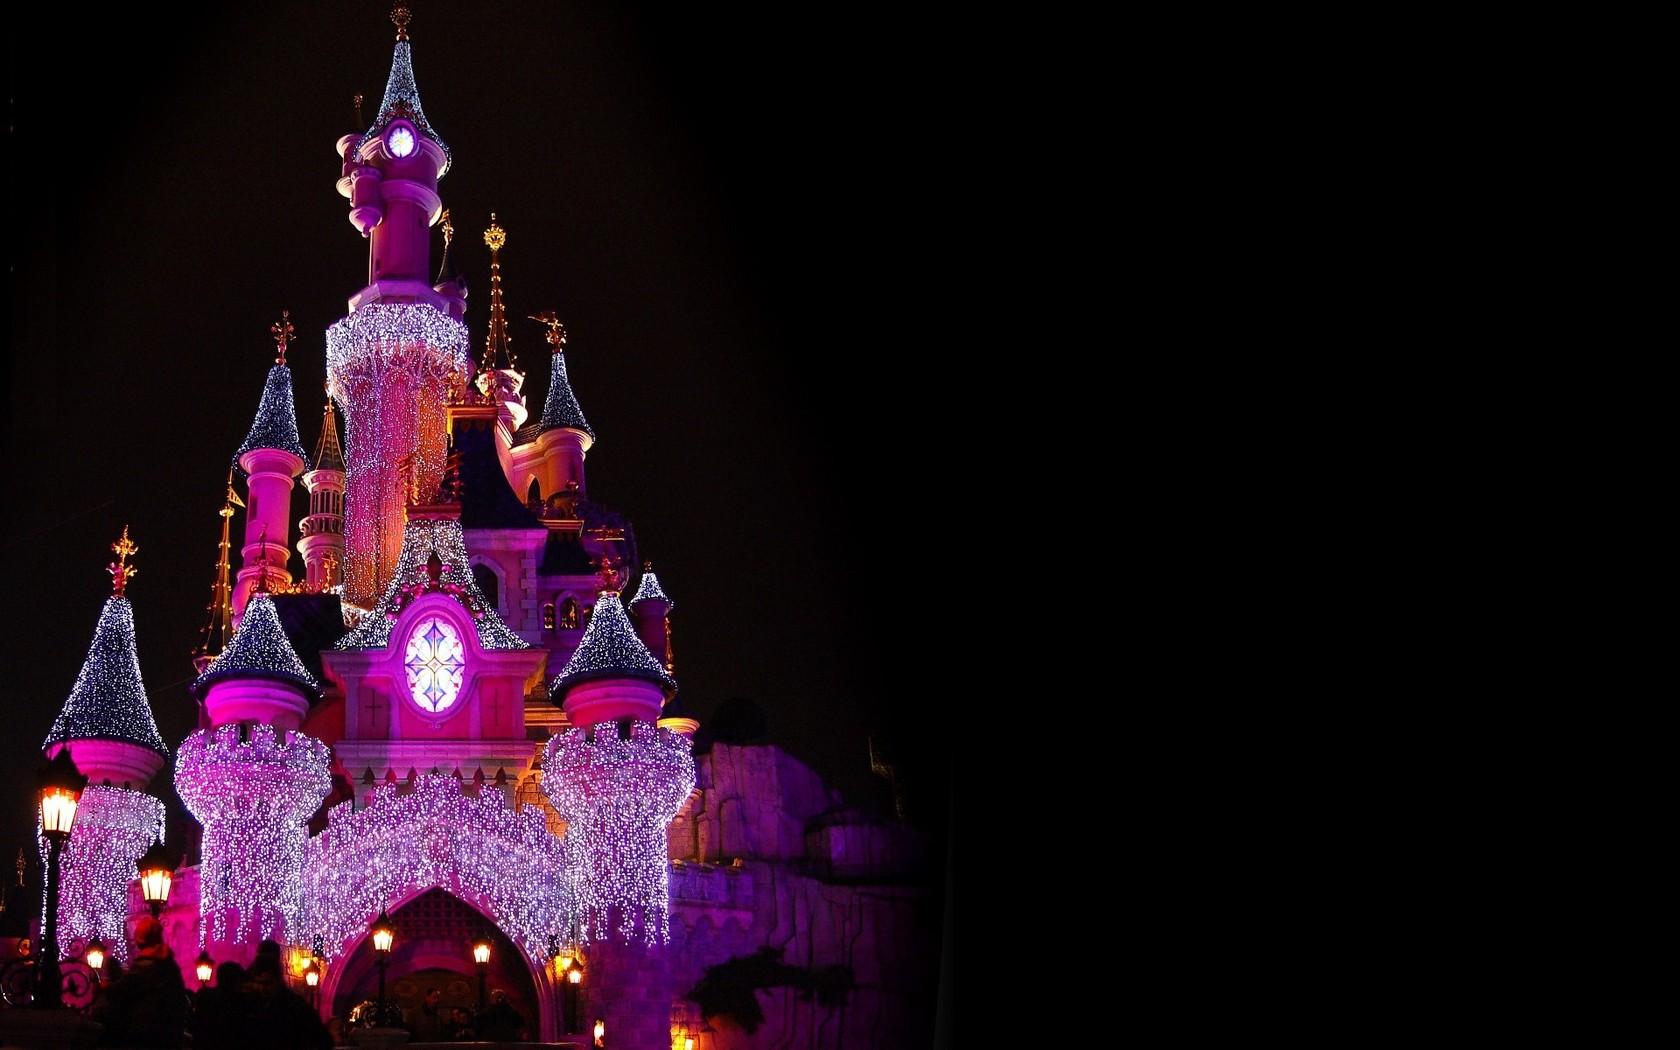 Download Cinderella Castle   Walt Disney World wallpaper 1680x1050